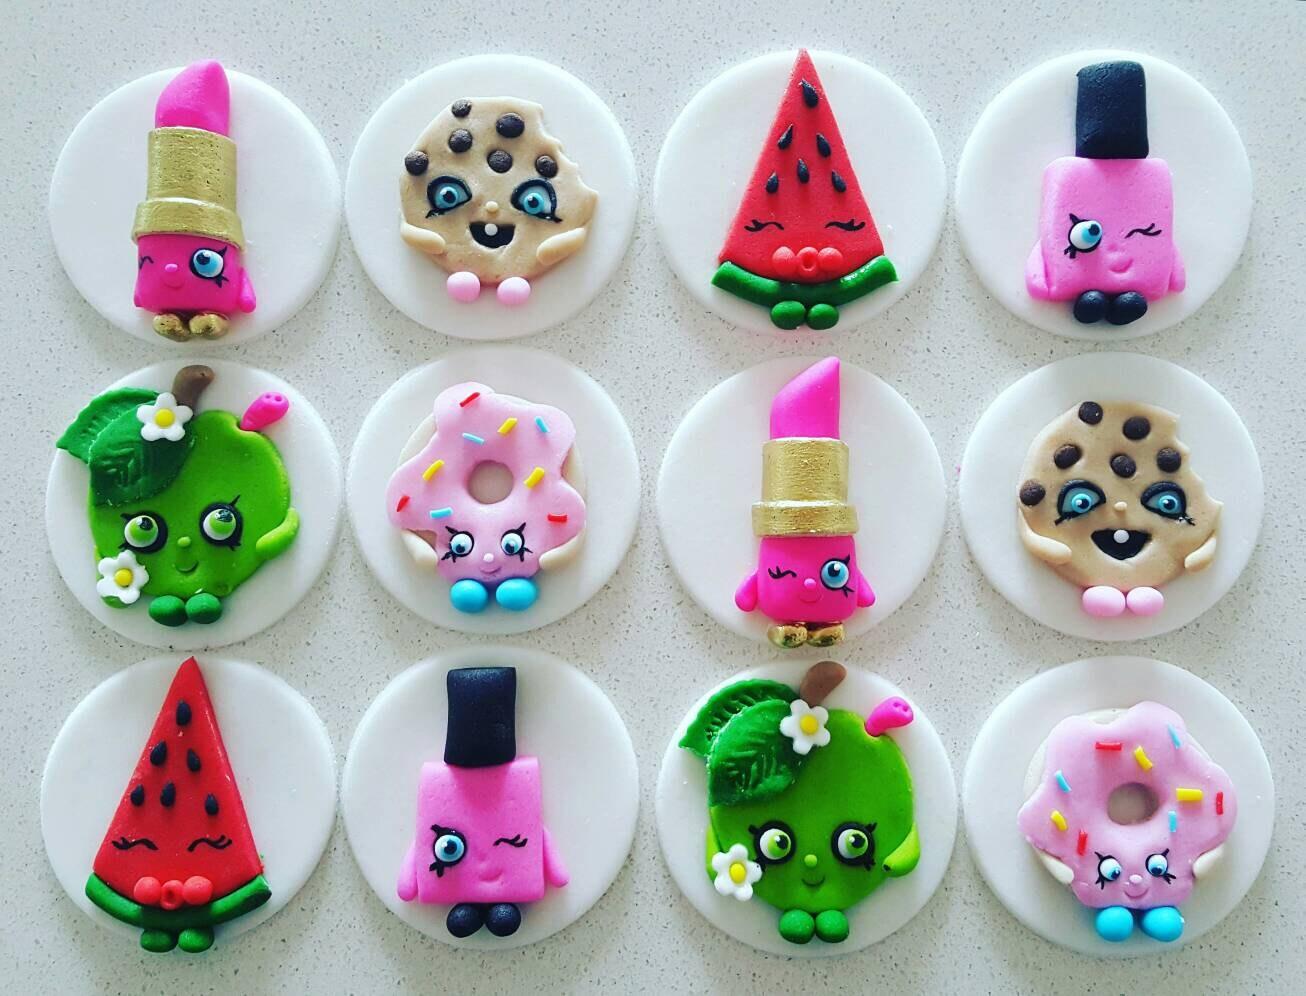 12 x Shopkins fondant cupcake toppers by MadAboutCakeToppers